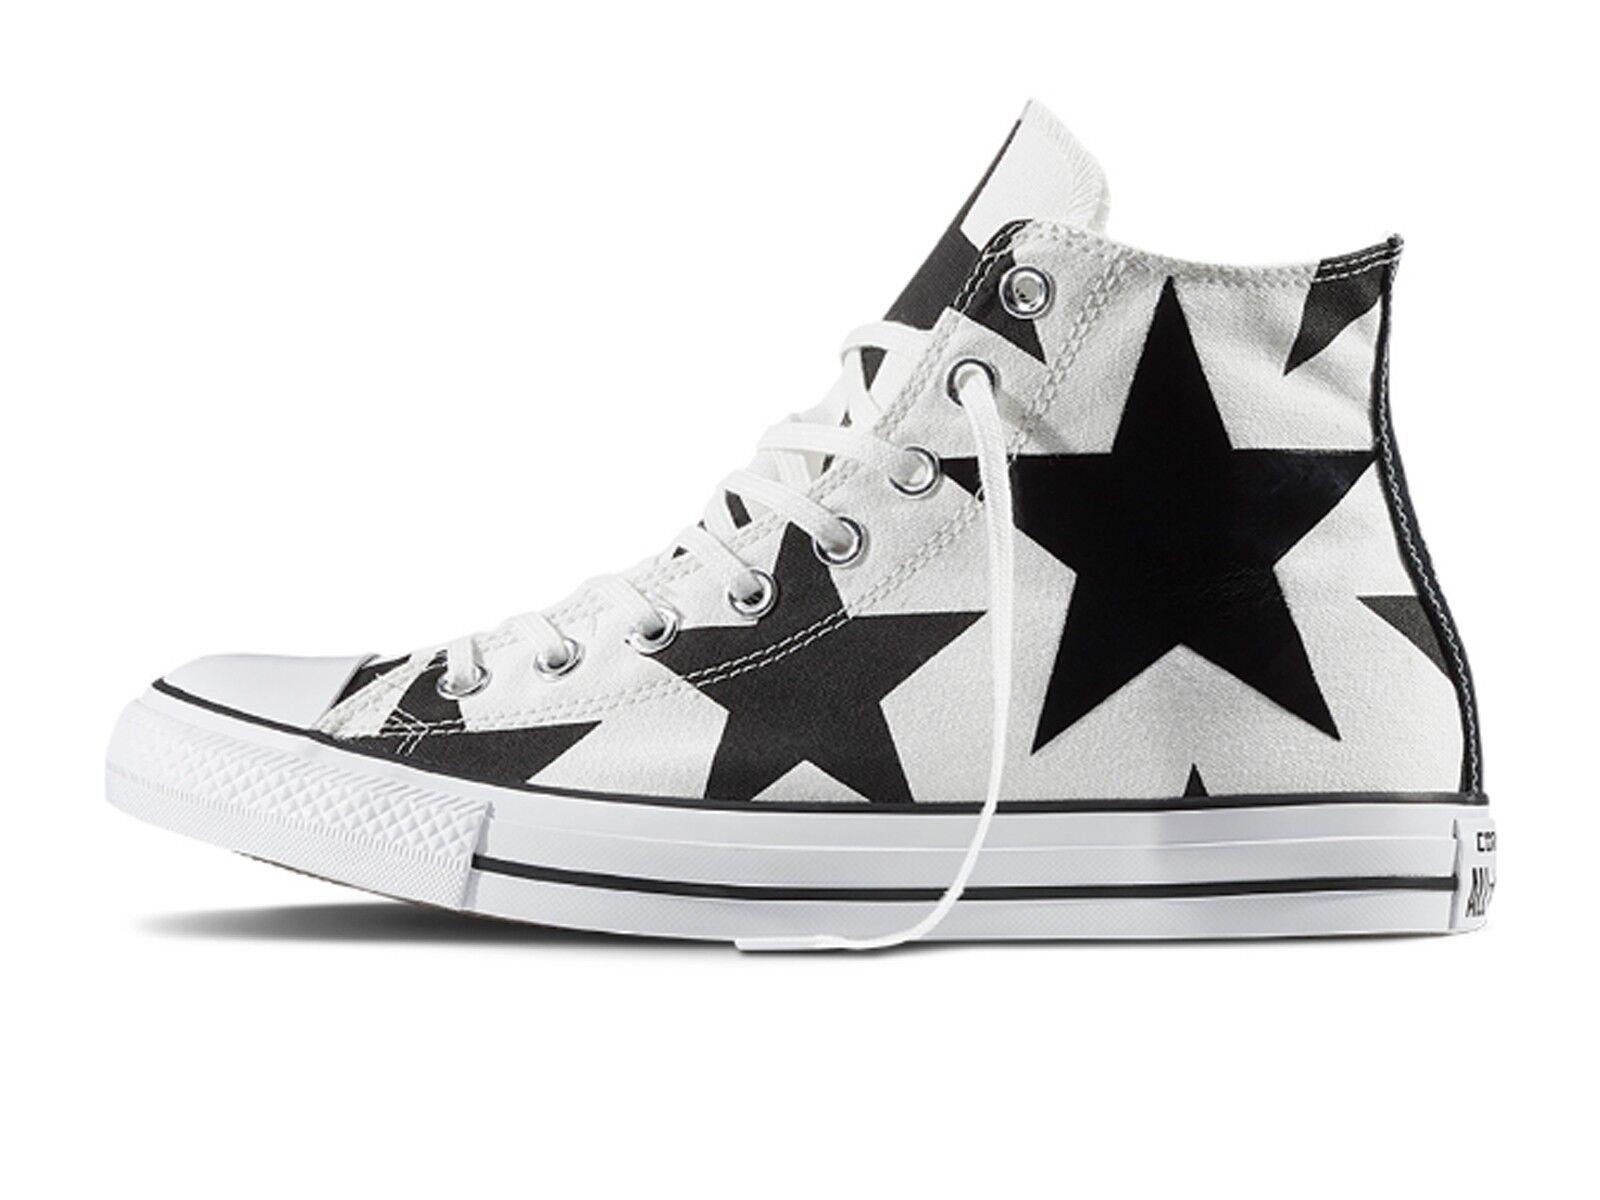 zapatos UNISEX CONVERSE  156812C 156812C 156812C  ALL STAR HI CANVAS PRINT blanco negro BIG STAR  saludable